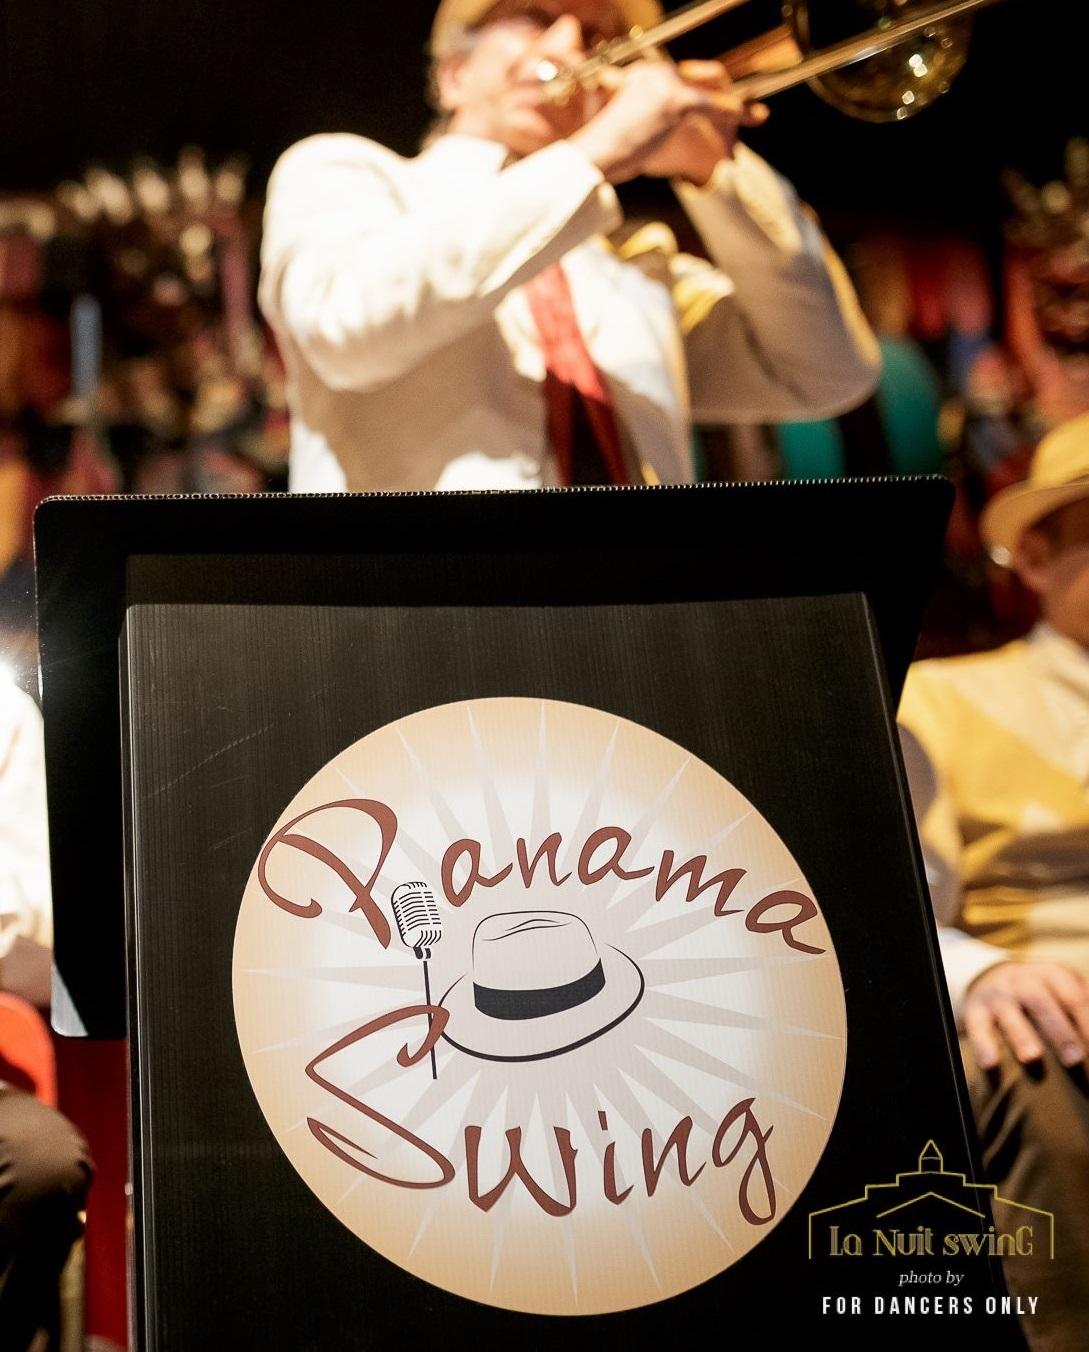 Panama Swing